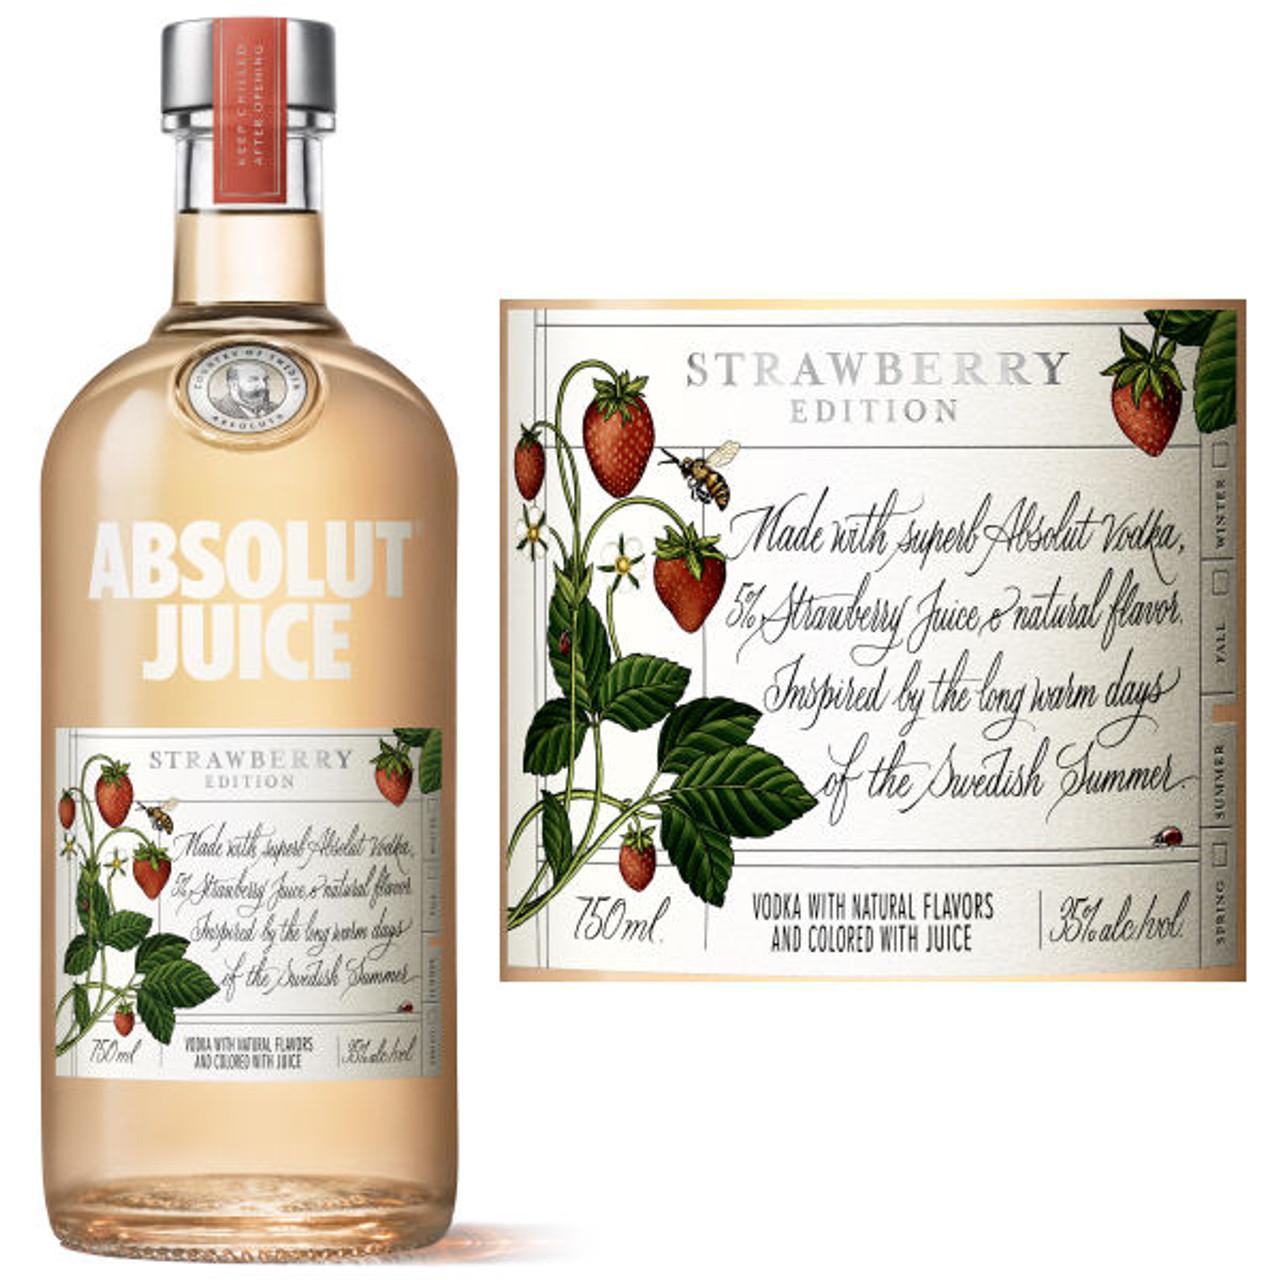 Absolut Juice Strawberry Edition Vodka 750ml